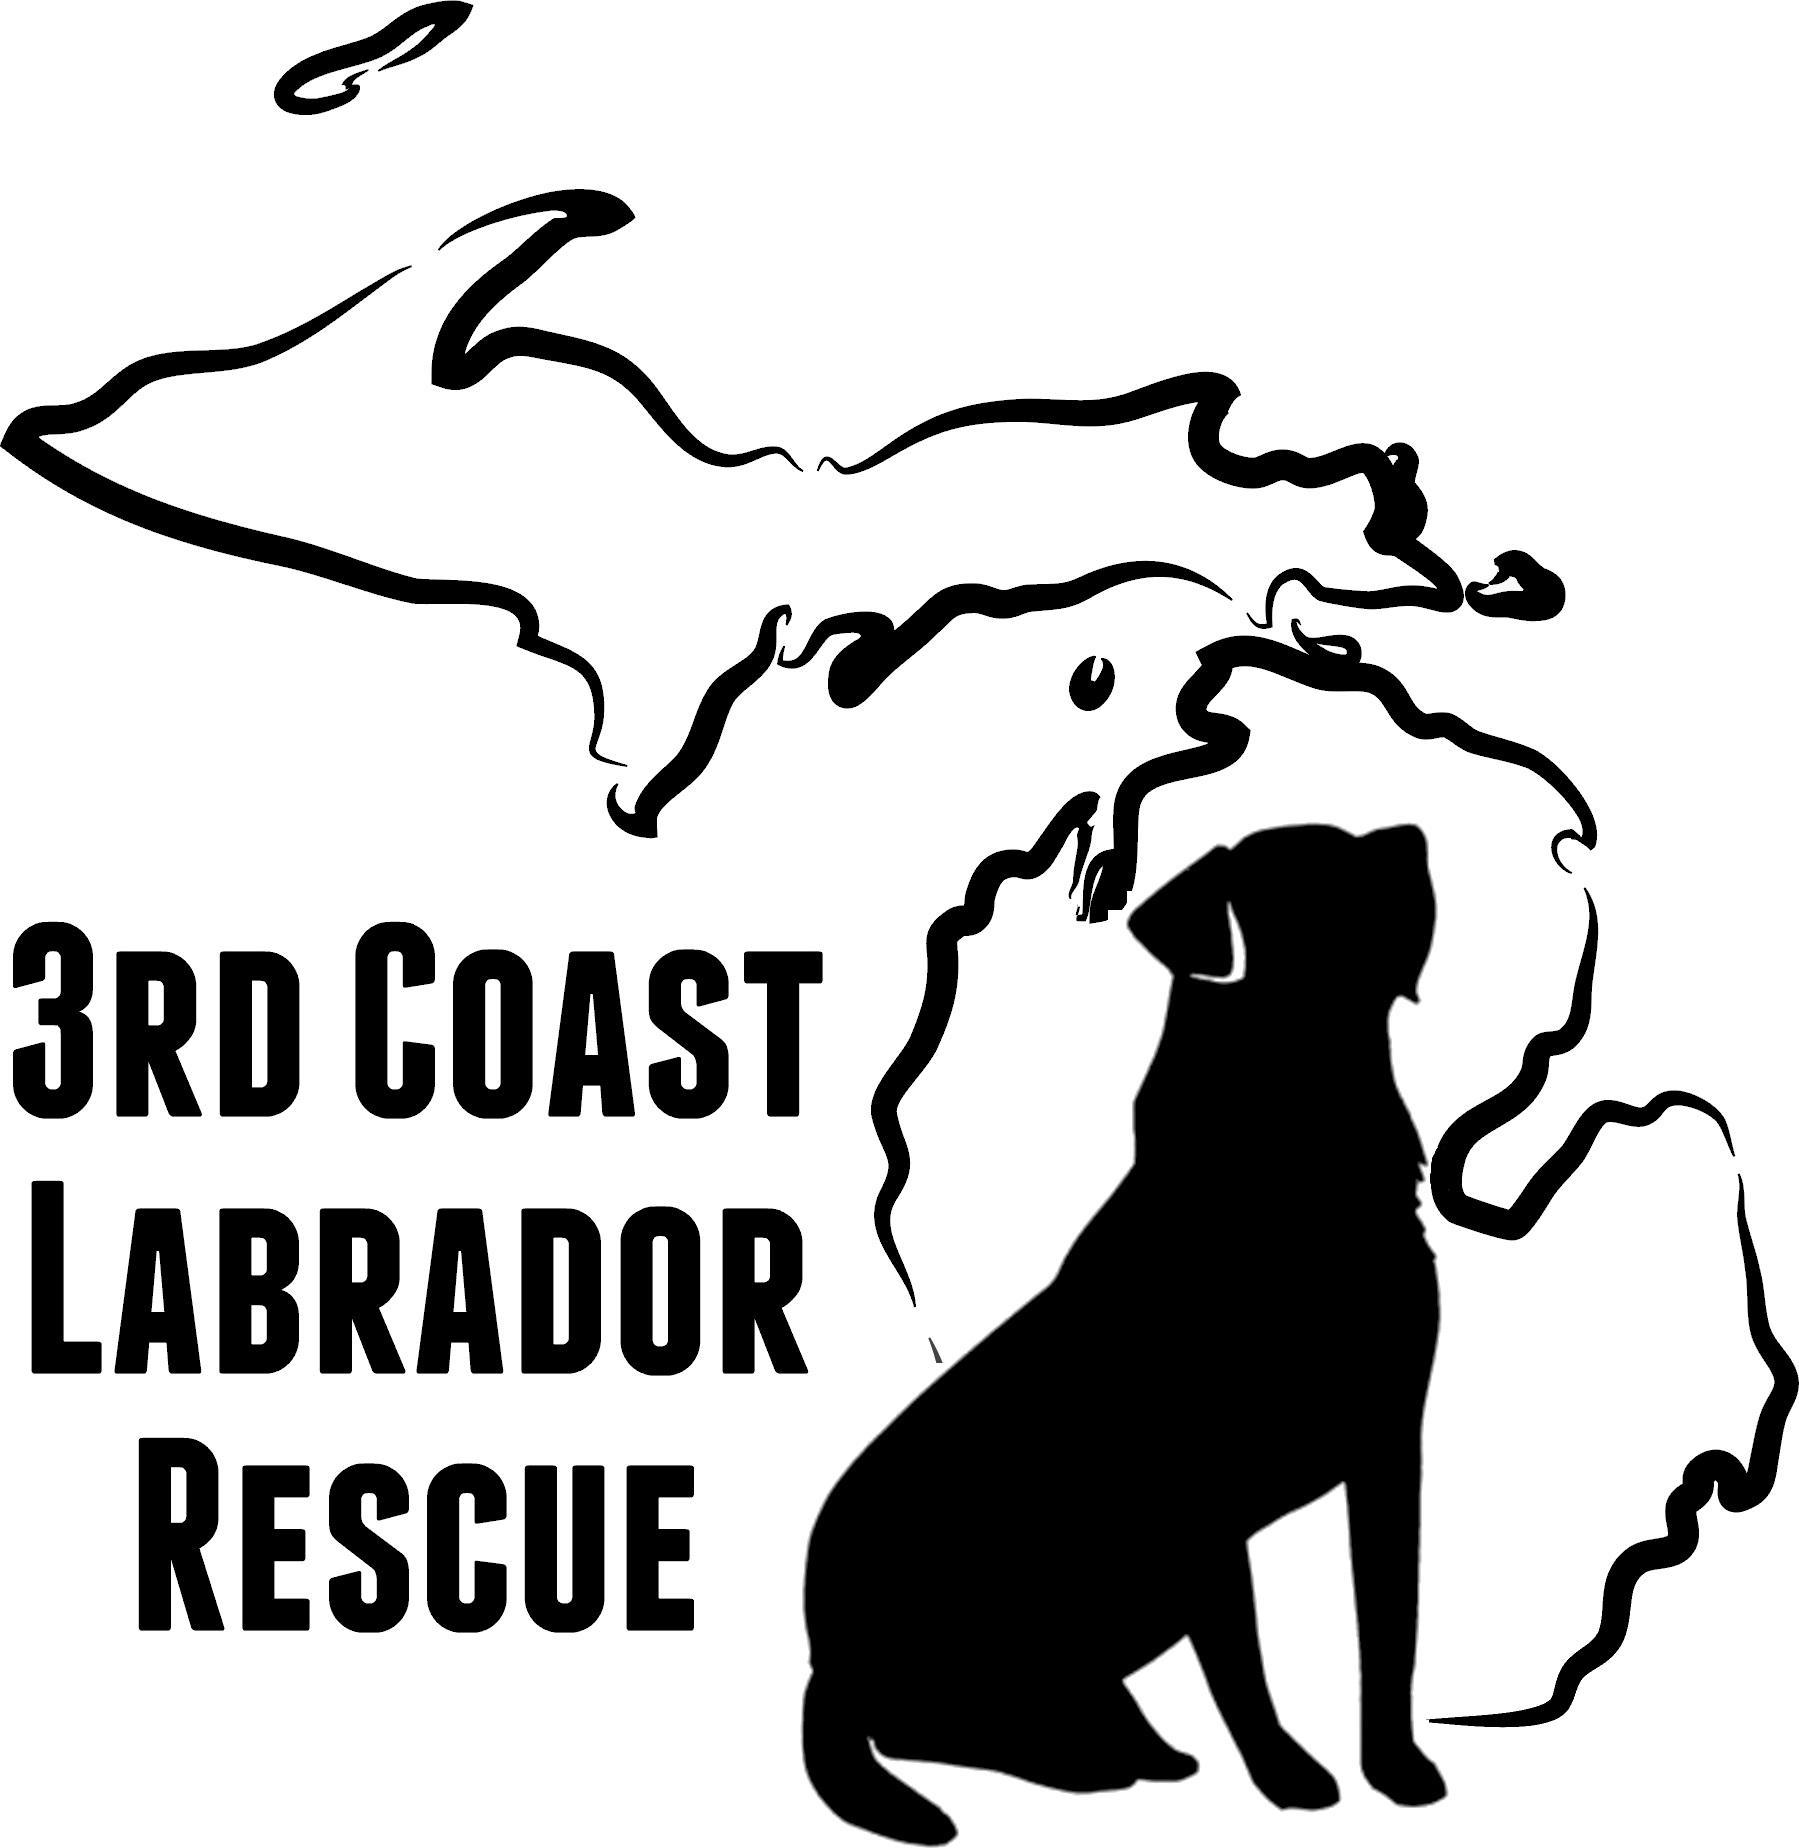 3rd Coast Labrador Rescue